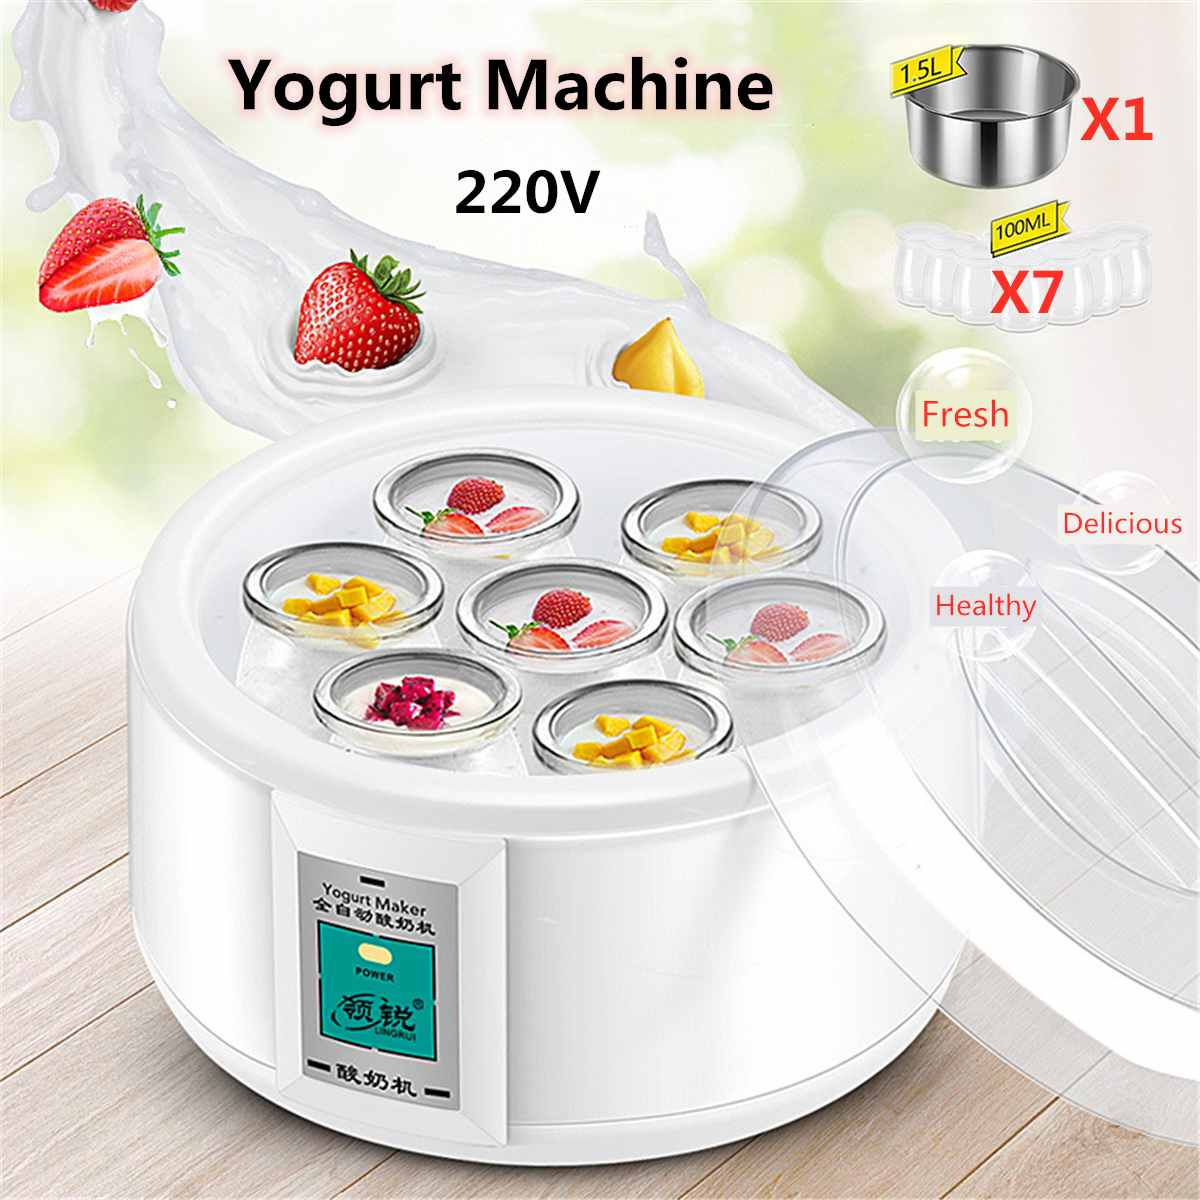 1.5L Electric Yogurt Maker Yogurt DIY Tool Kitchen Appliances Automatic Yogurt Maker with 7 Jars Liner Material Stainless Steel